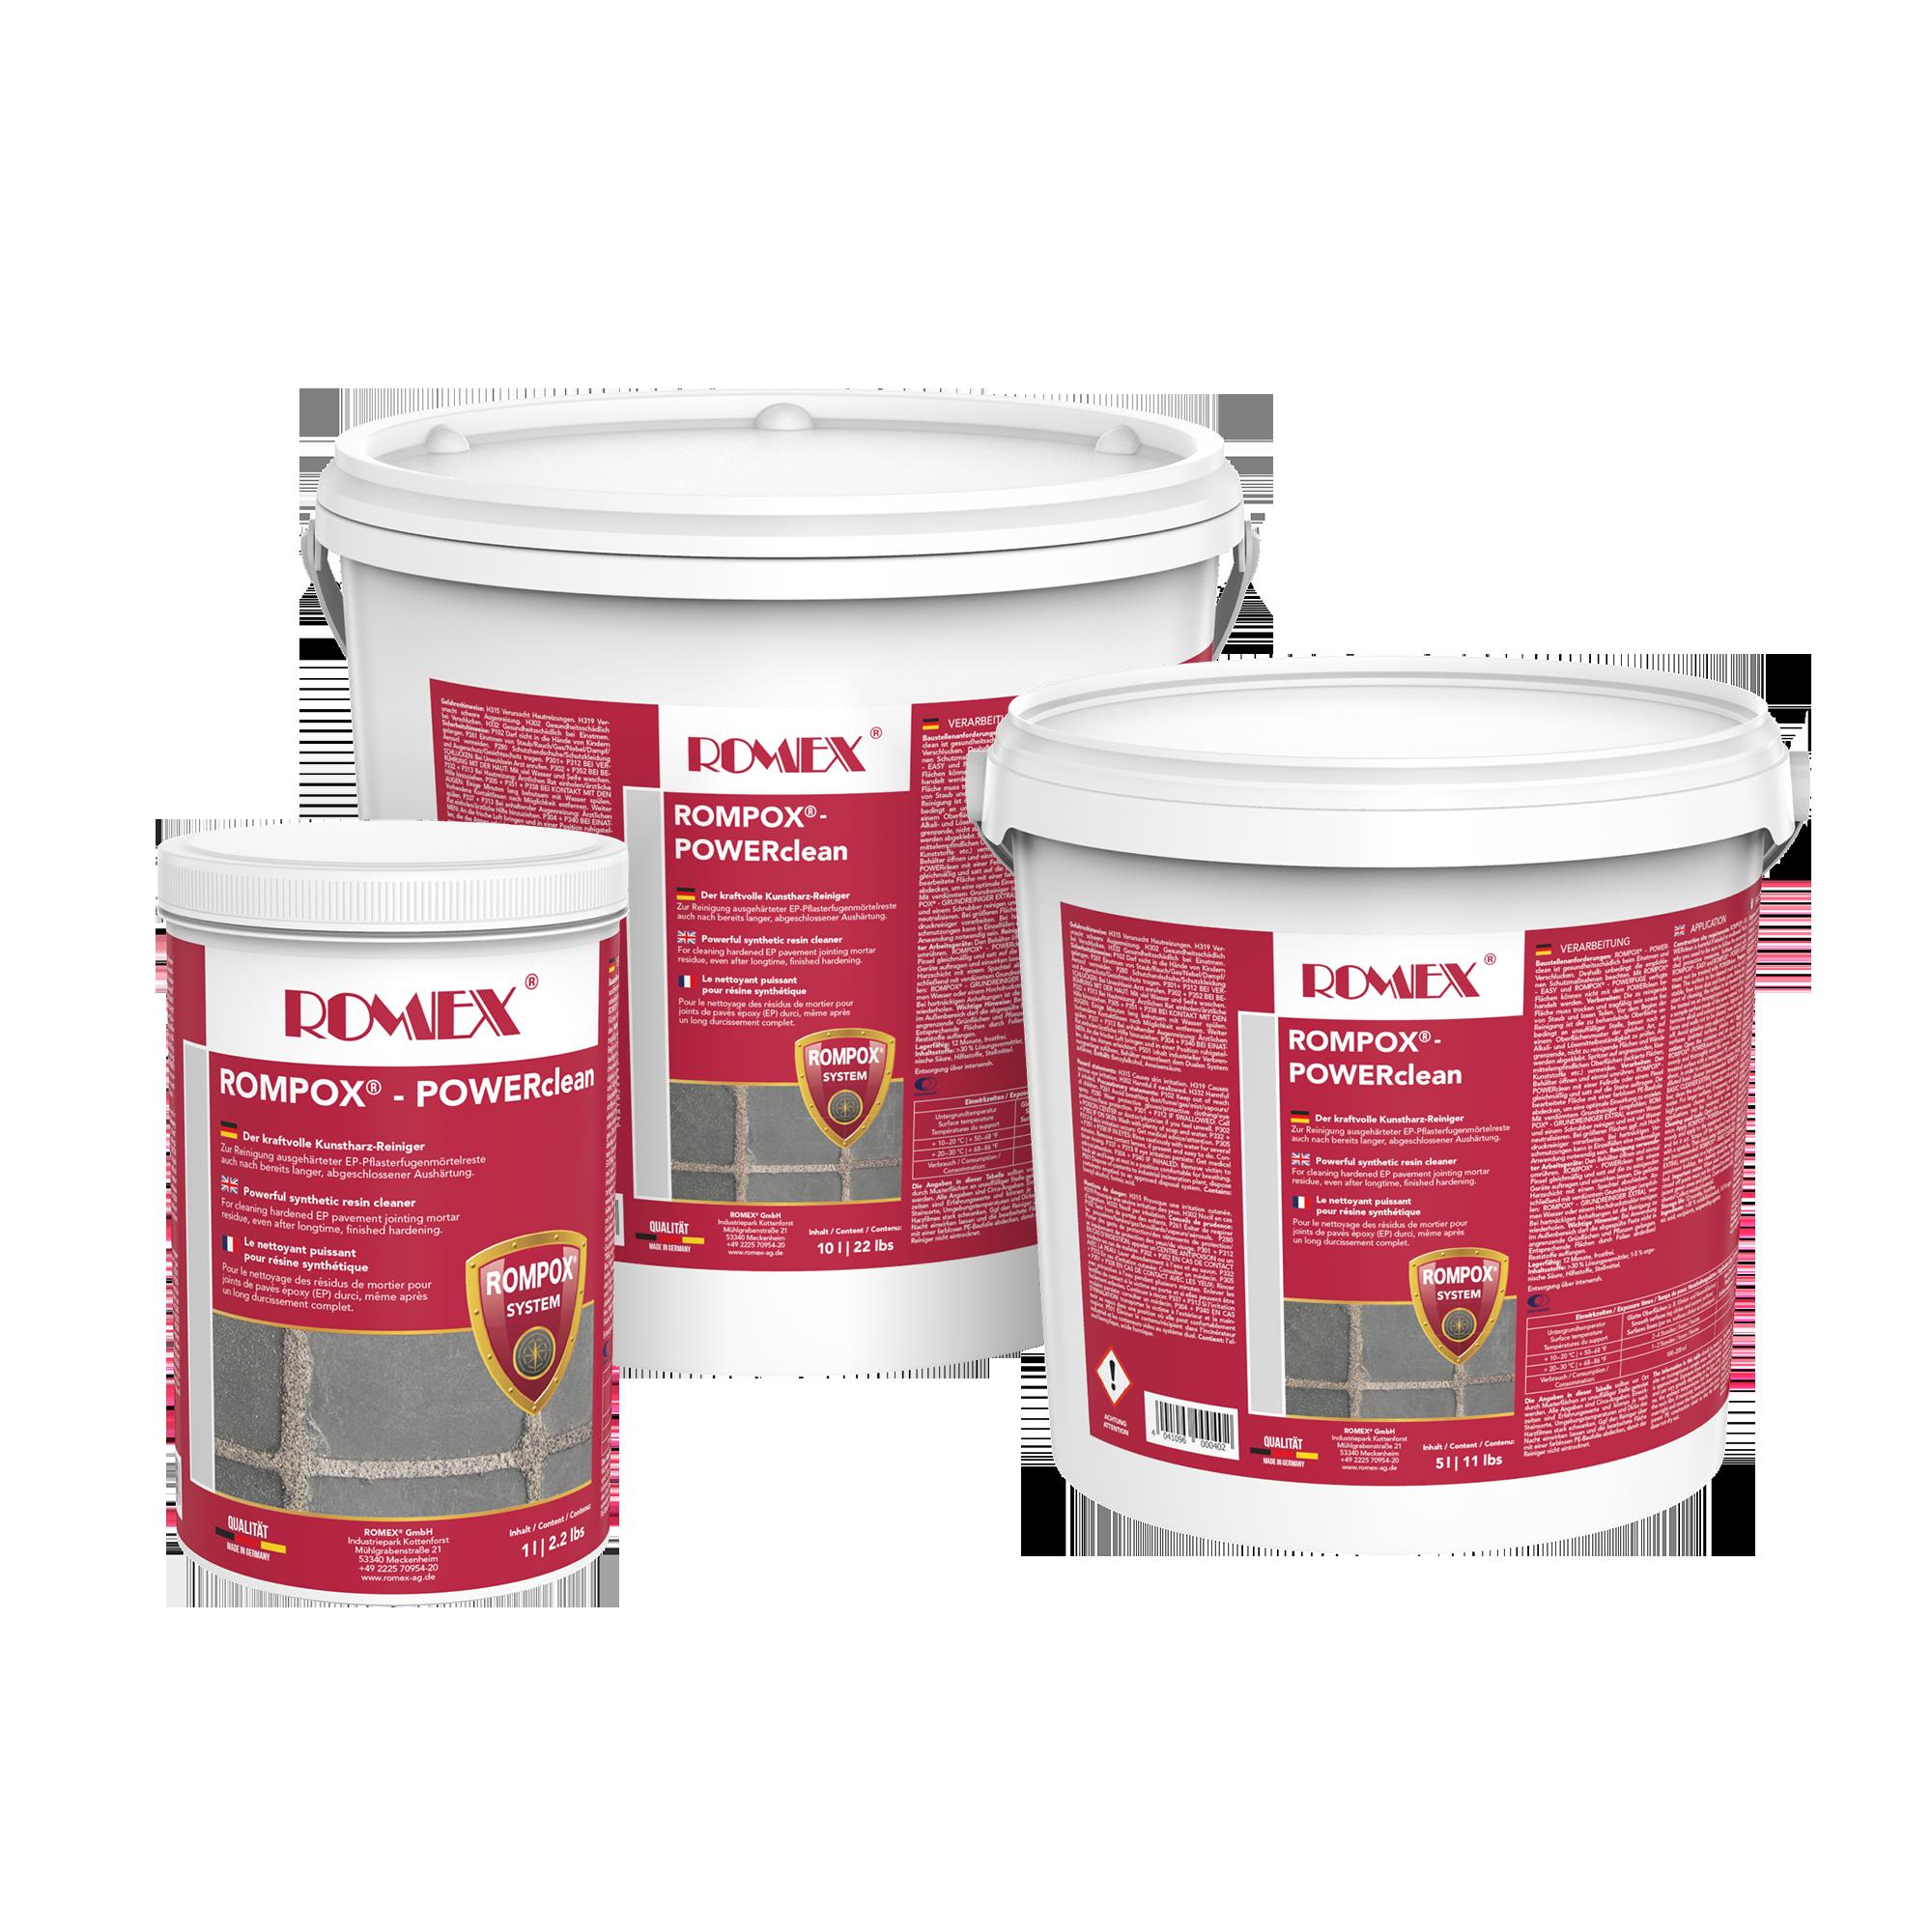 ROMPOX® - POWERclean 1 - 10 Liter